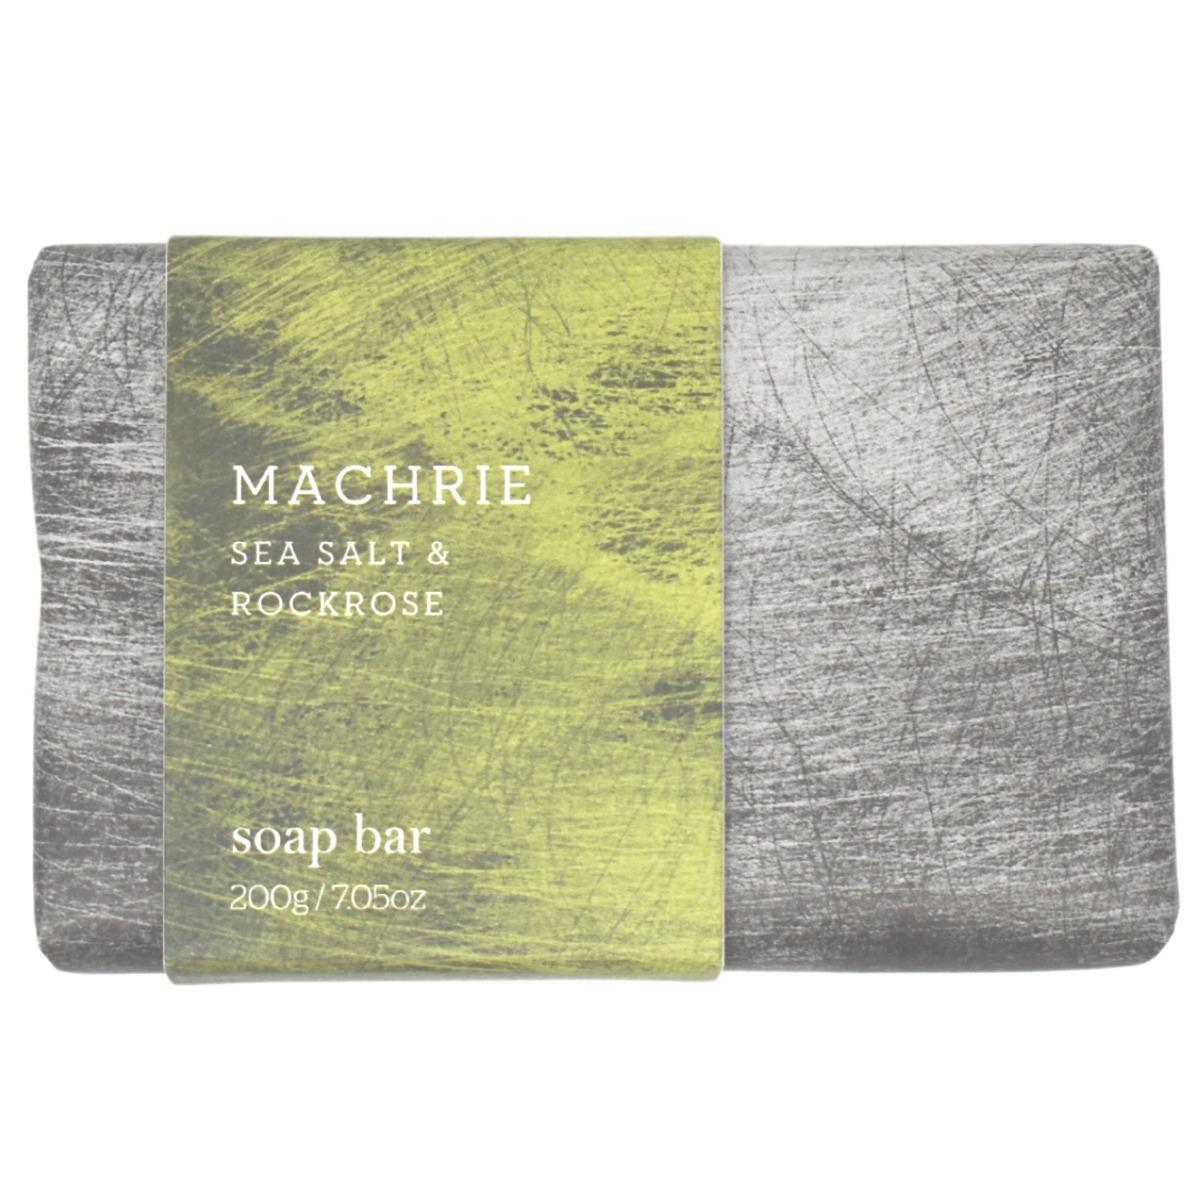 Arran Machrie Sea Salt and Rockrose Soap Bar in Tin 200g